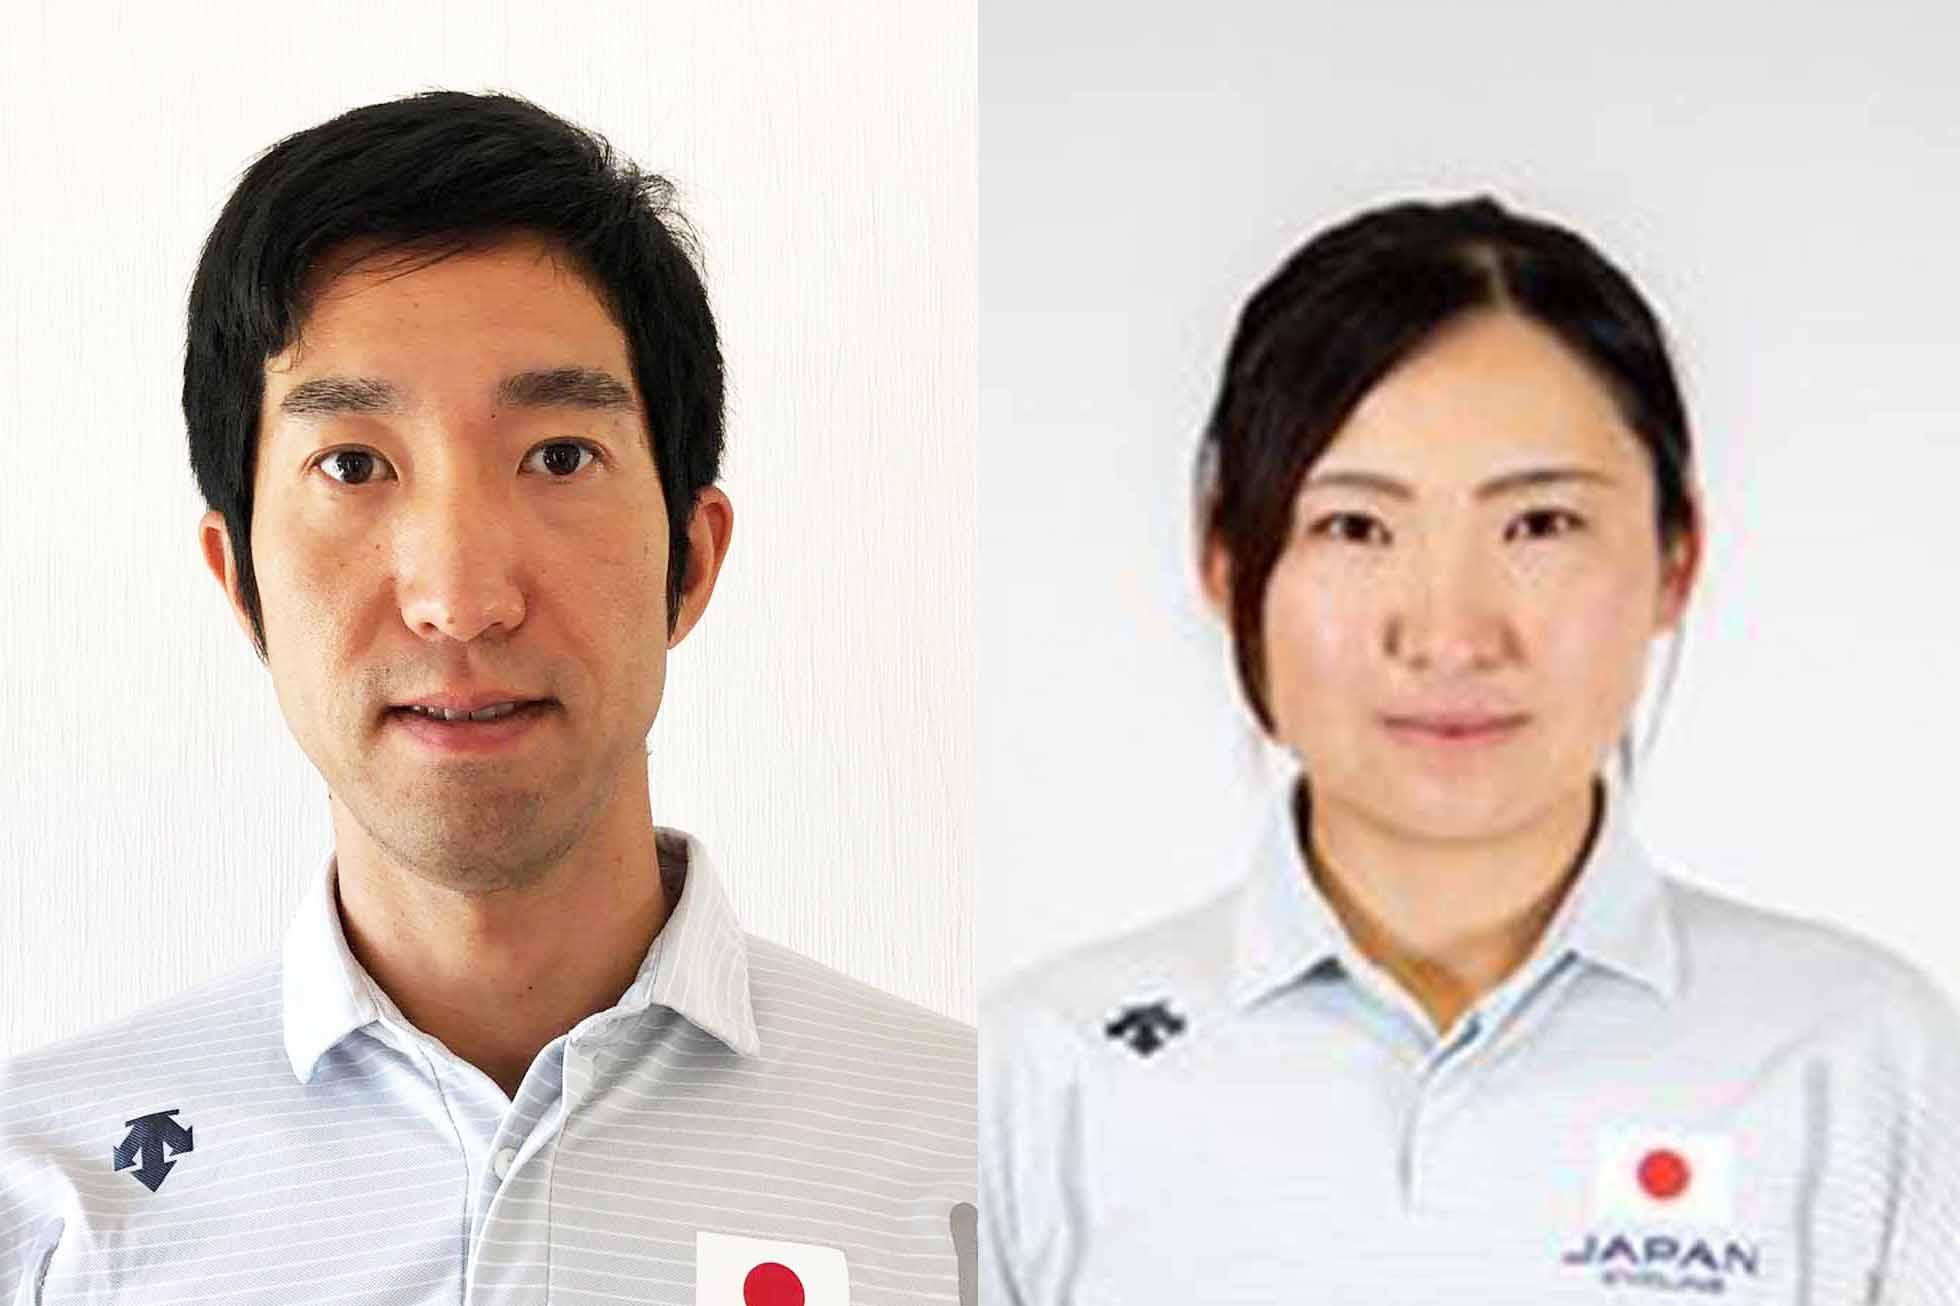 MTB(マウンテンバイク)東京オリンピック日本代表 山本幸平 今井美穂